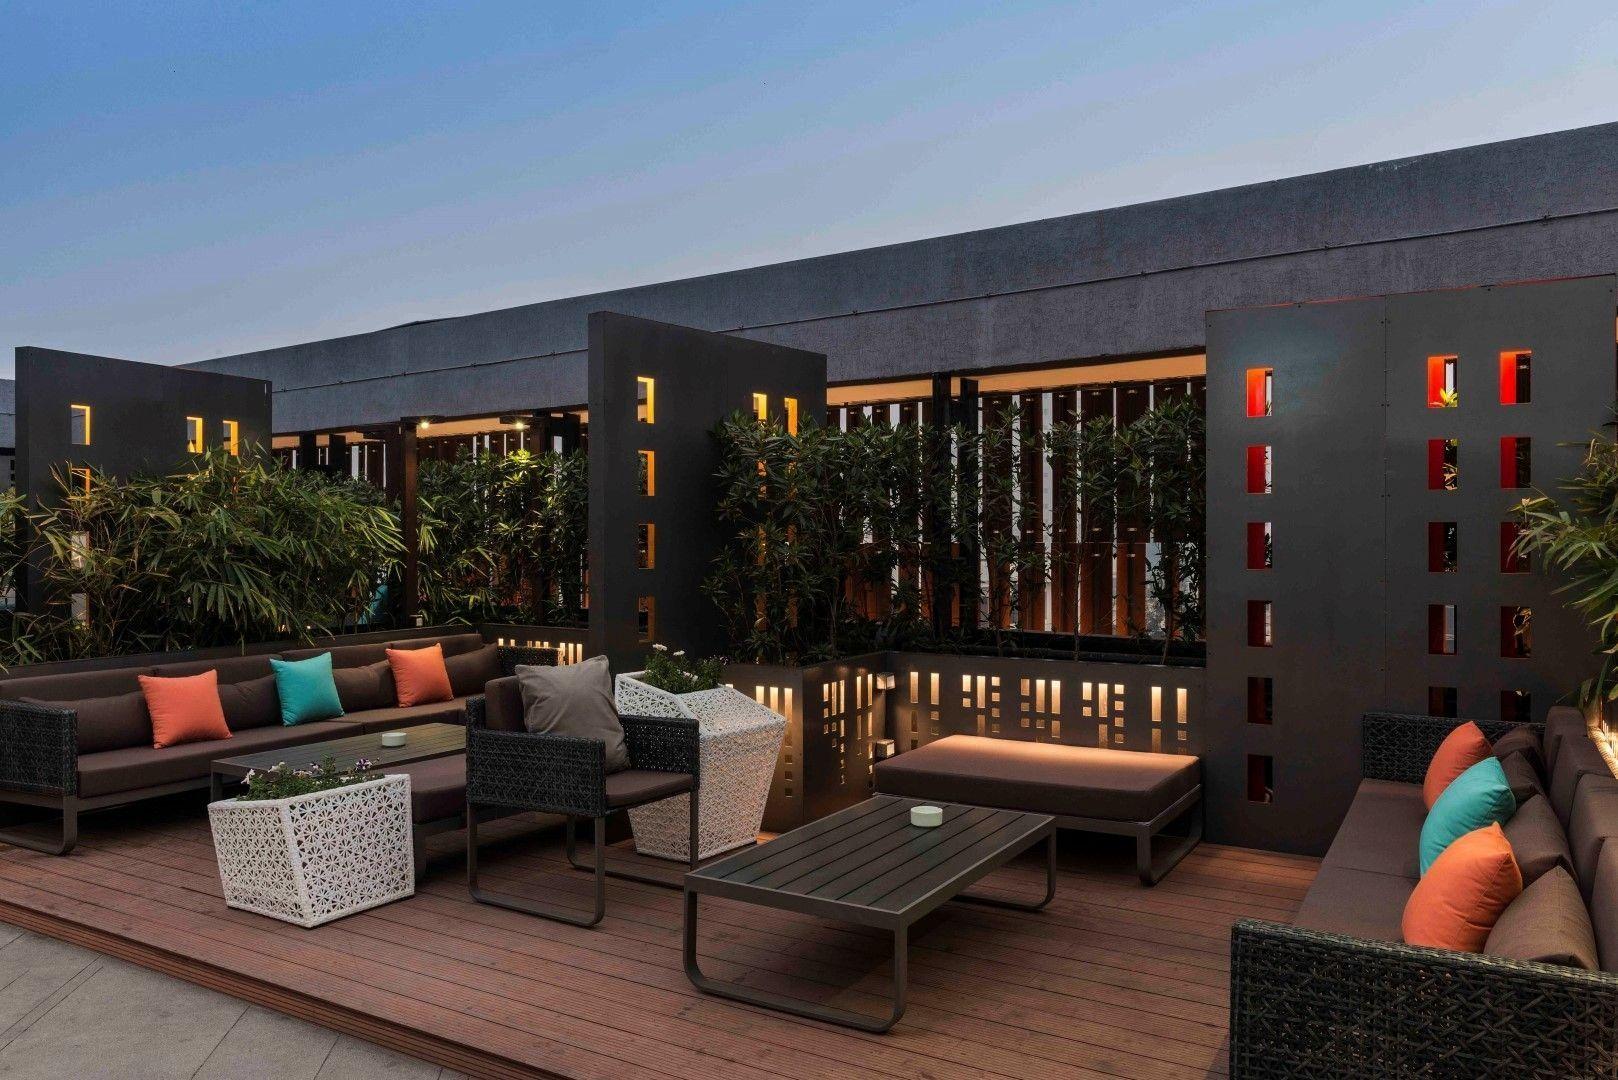 Restaurant Architects Terrace Balcony Lucknow Jobalia Design Levana Suites Studio Hotel Hiral Diary Cafe Thet In 2020 Cafe Terrace Cafe Design Architect